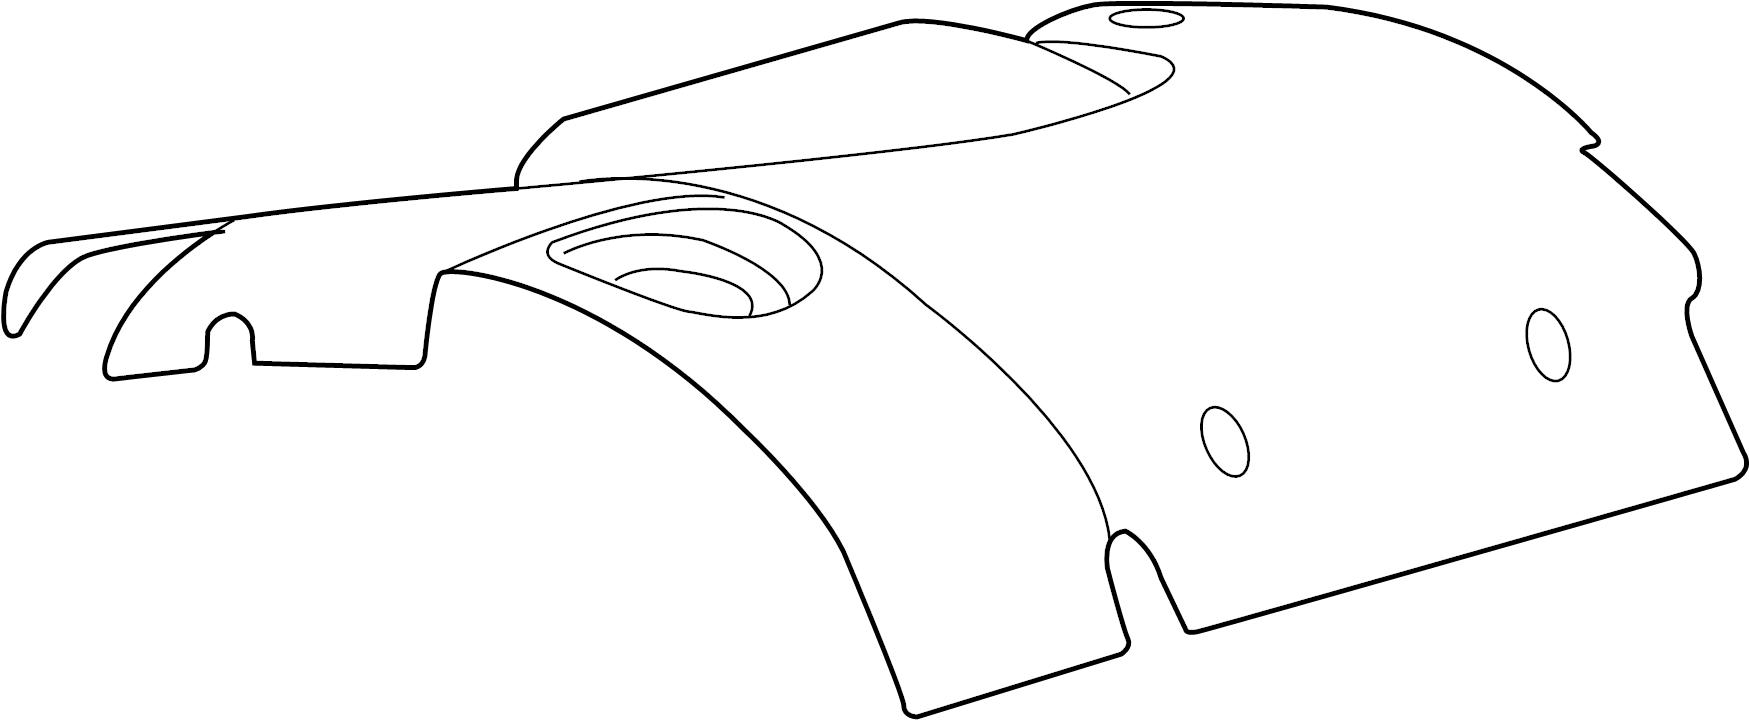 Jaguar S-Type Engine Cover. LITER, Rover, Land, APPEARANCE